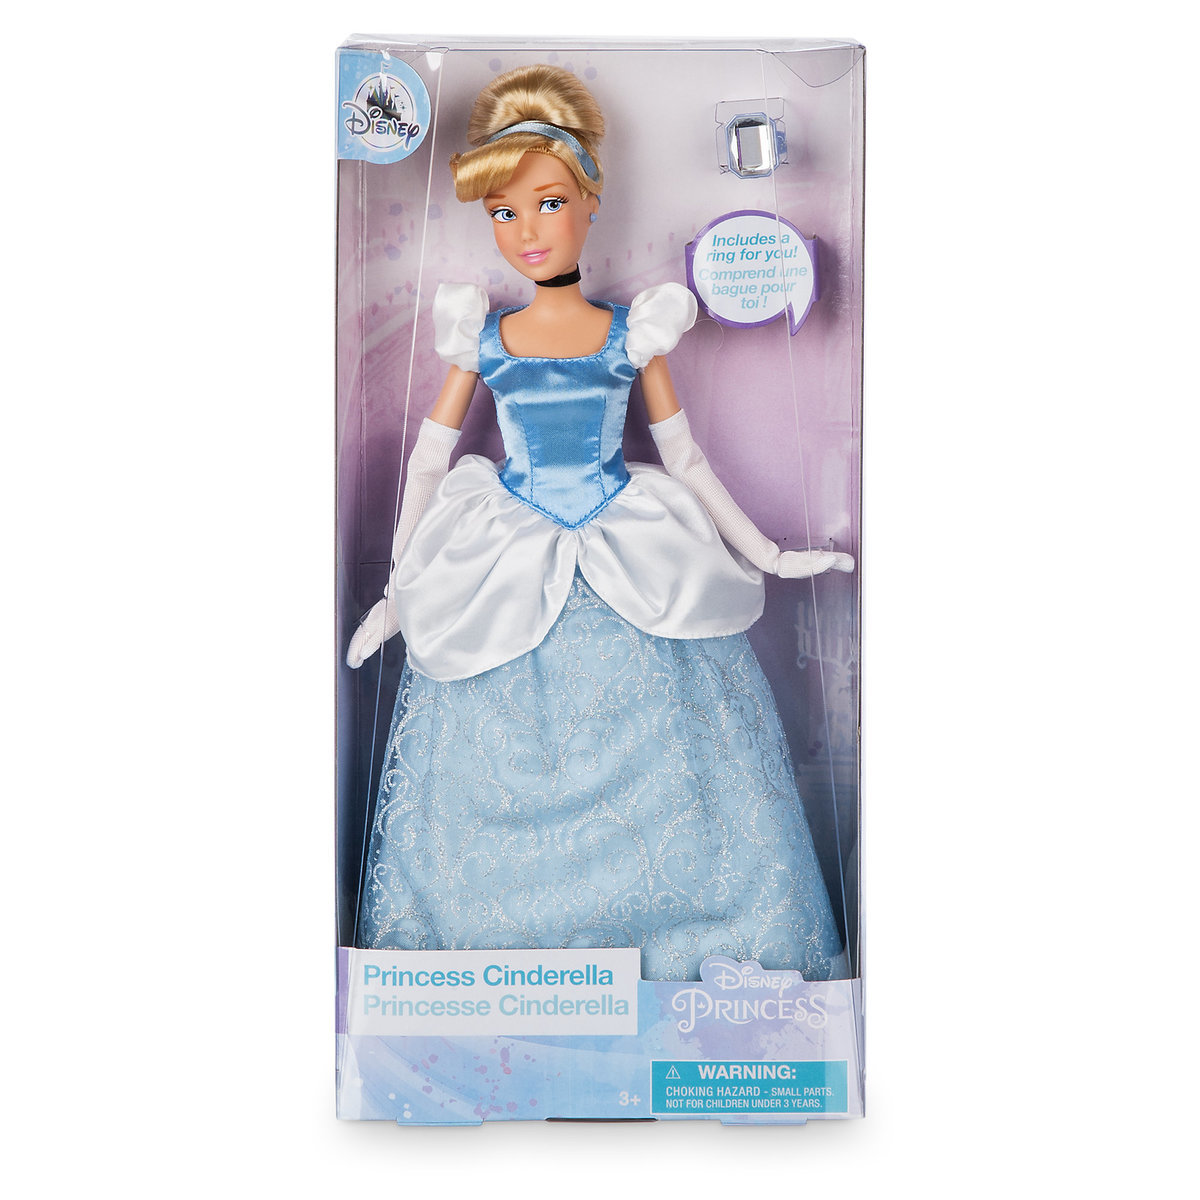 Cinderella Classic Doll with Ring - 12'' ของแท้ นำเข้าจากอเมริกา